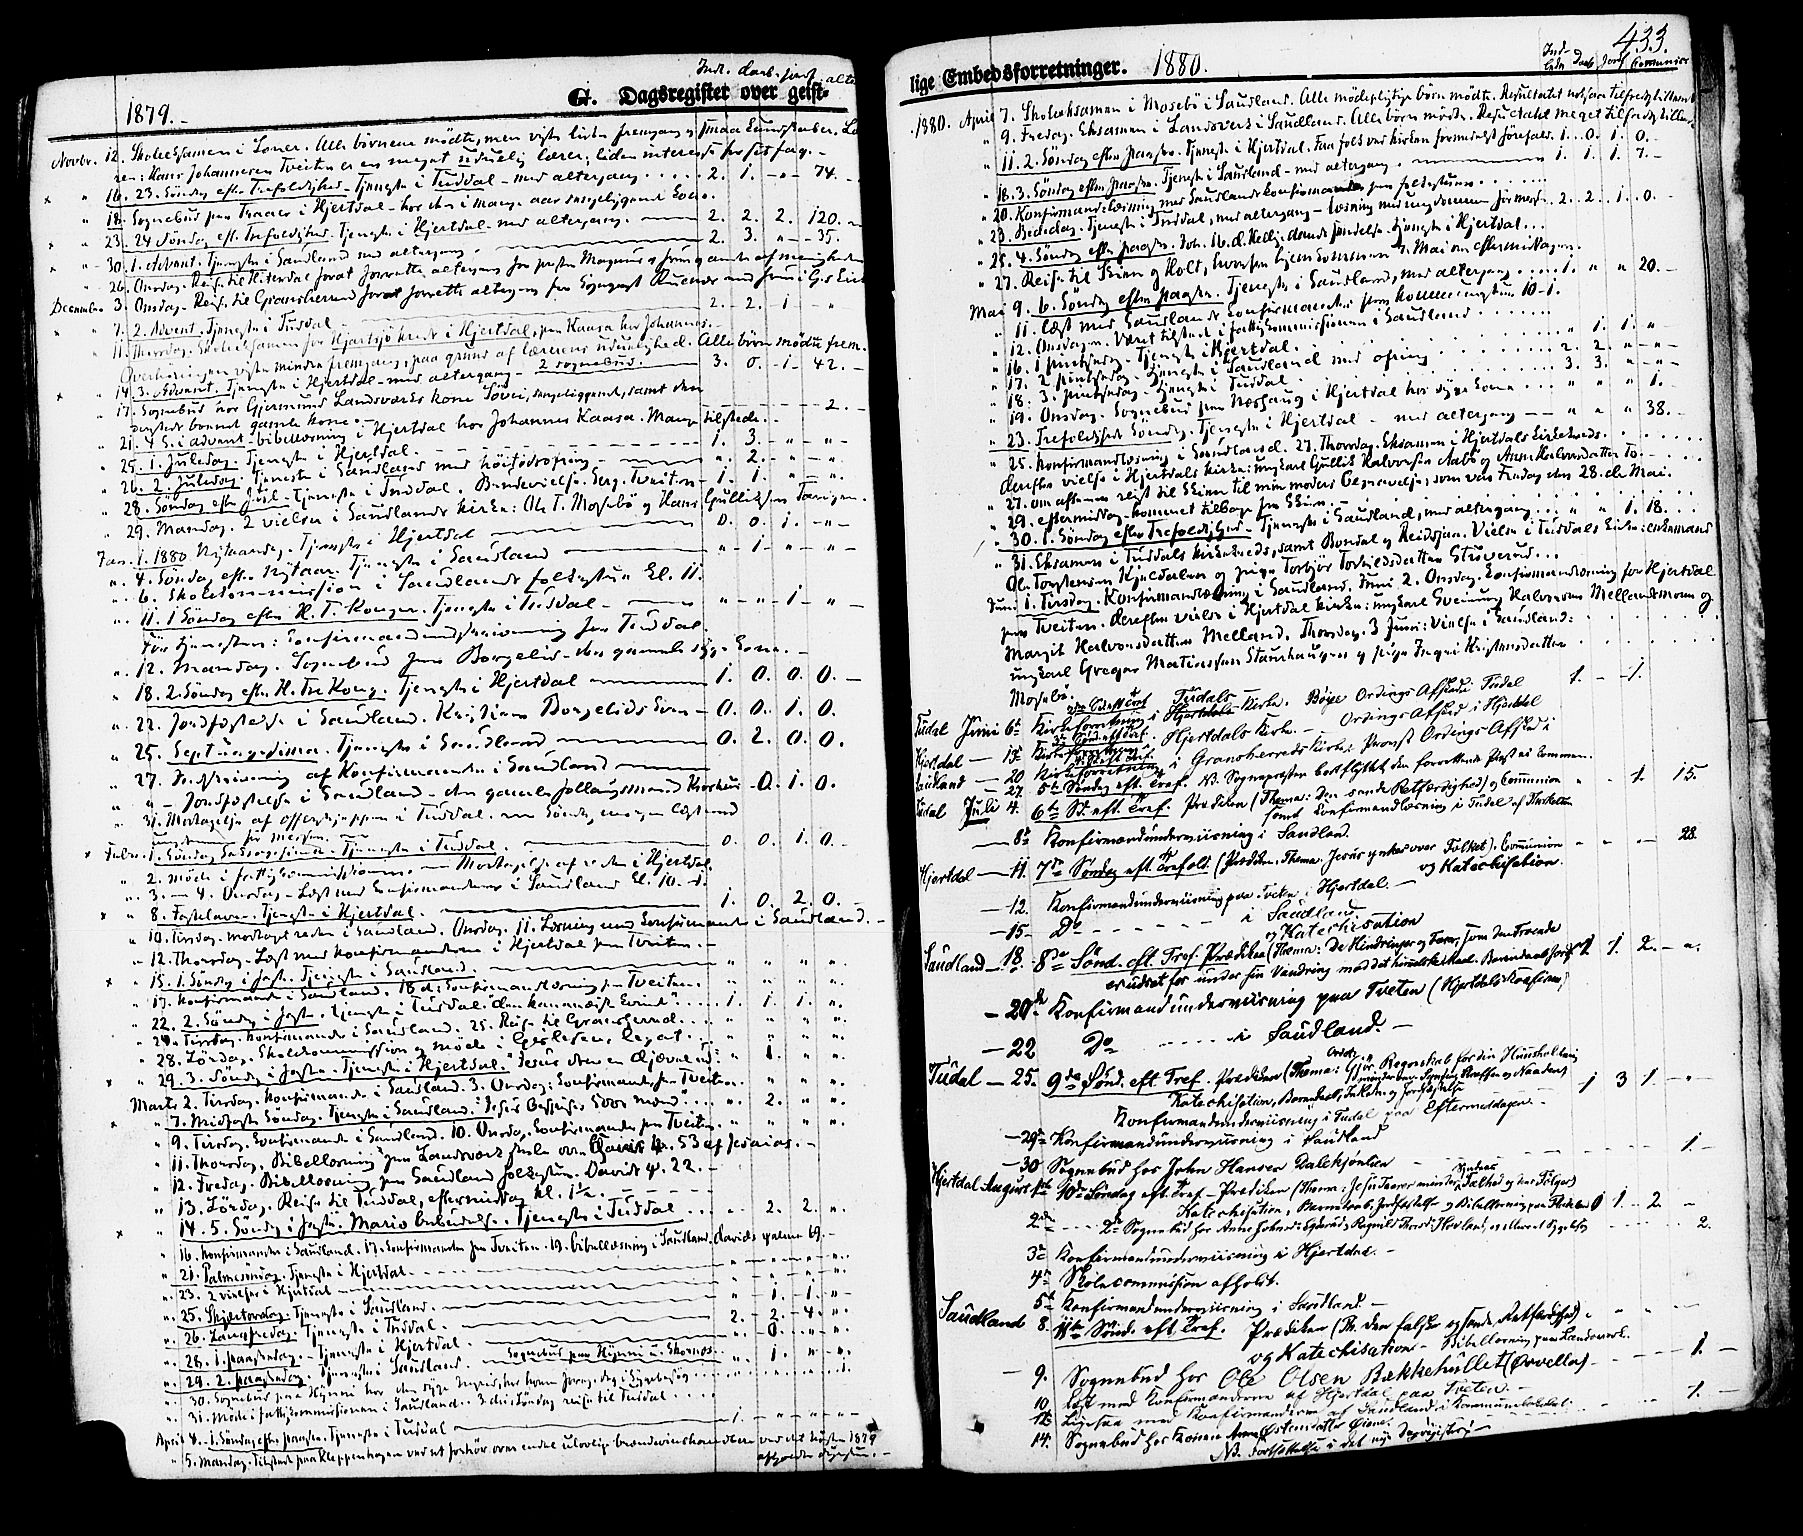 SAKO, Hjartdal kirkebøker, F/Fa/L0009: Ministerialbok nr. I 9, 1860-1879, s. 433